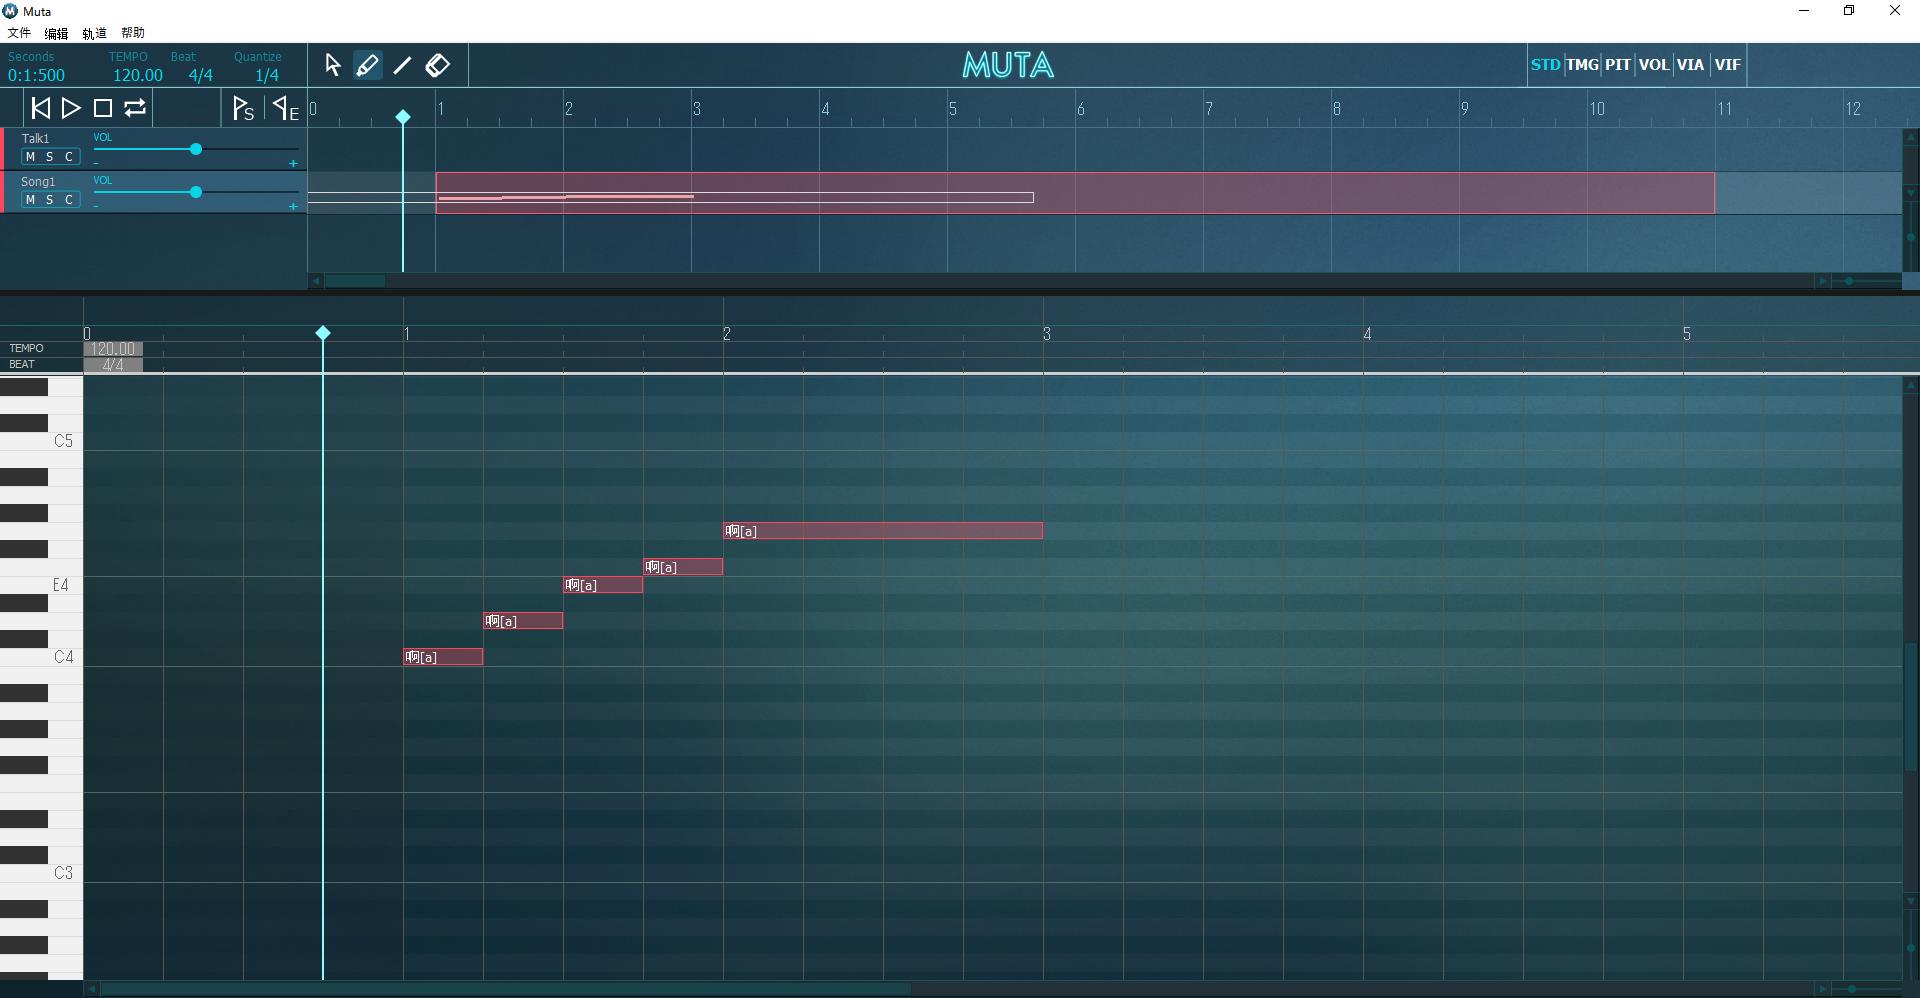 MUTA_SONG_STD